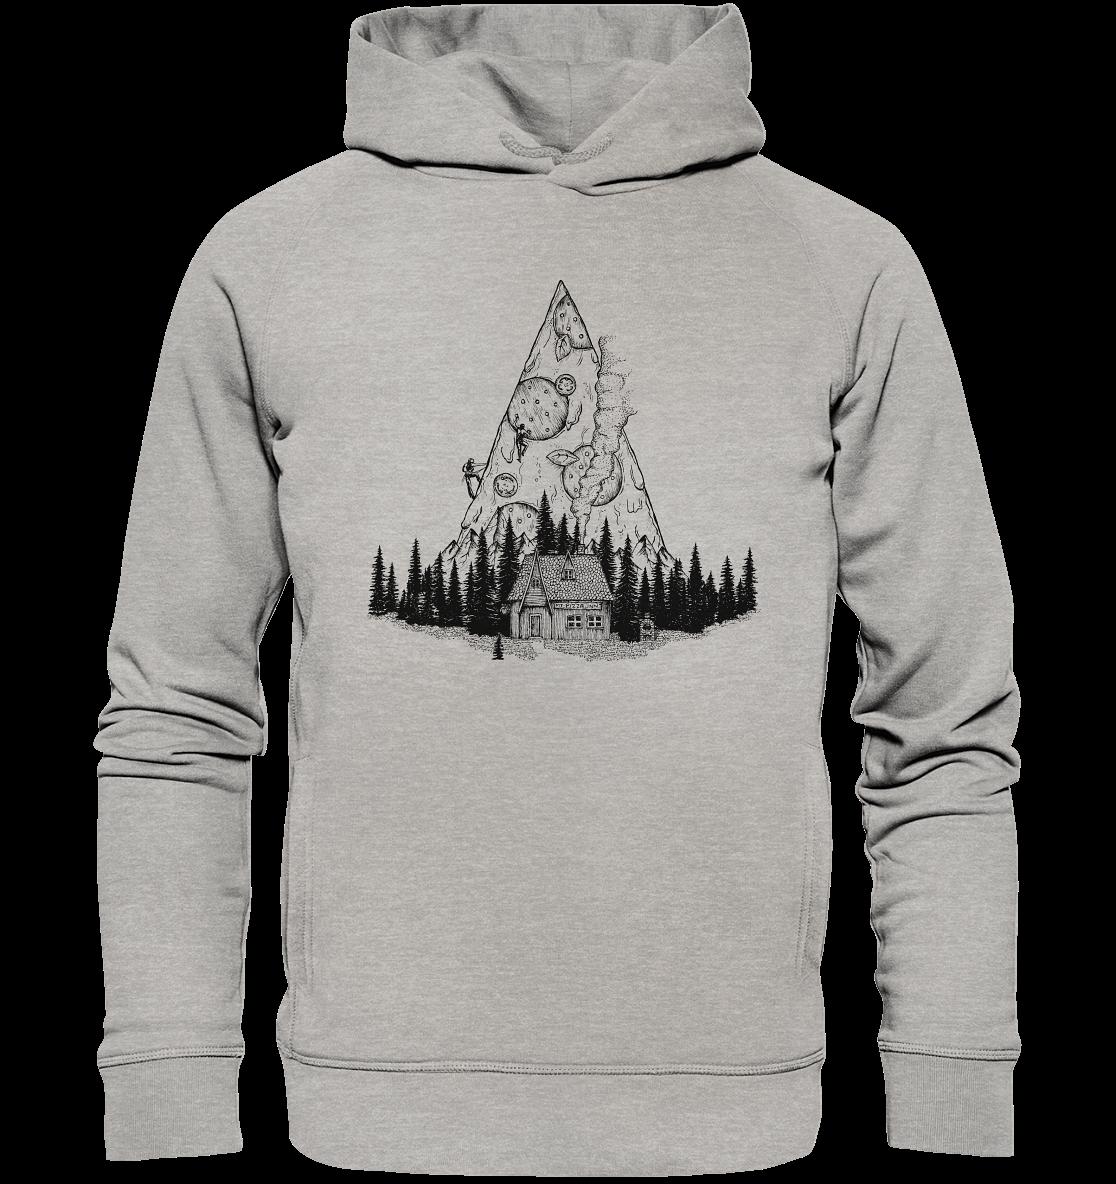 front-organic-fashion-hoodie-c2c1c0-1116x-6.png